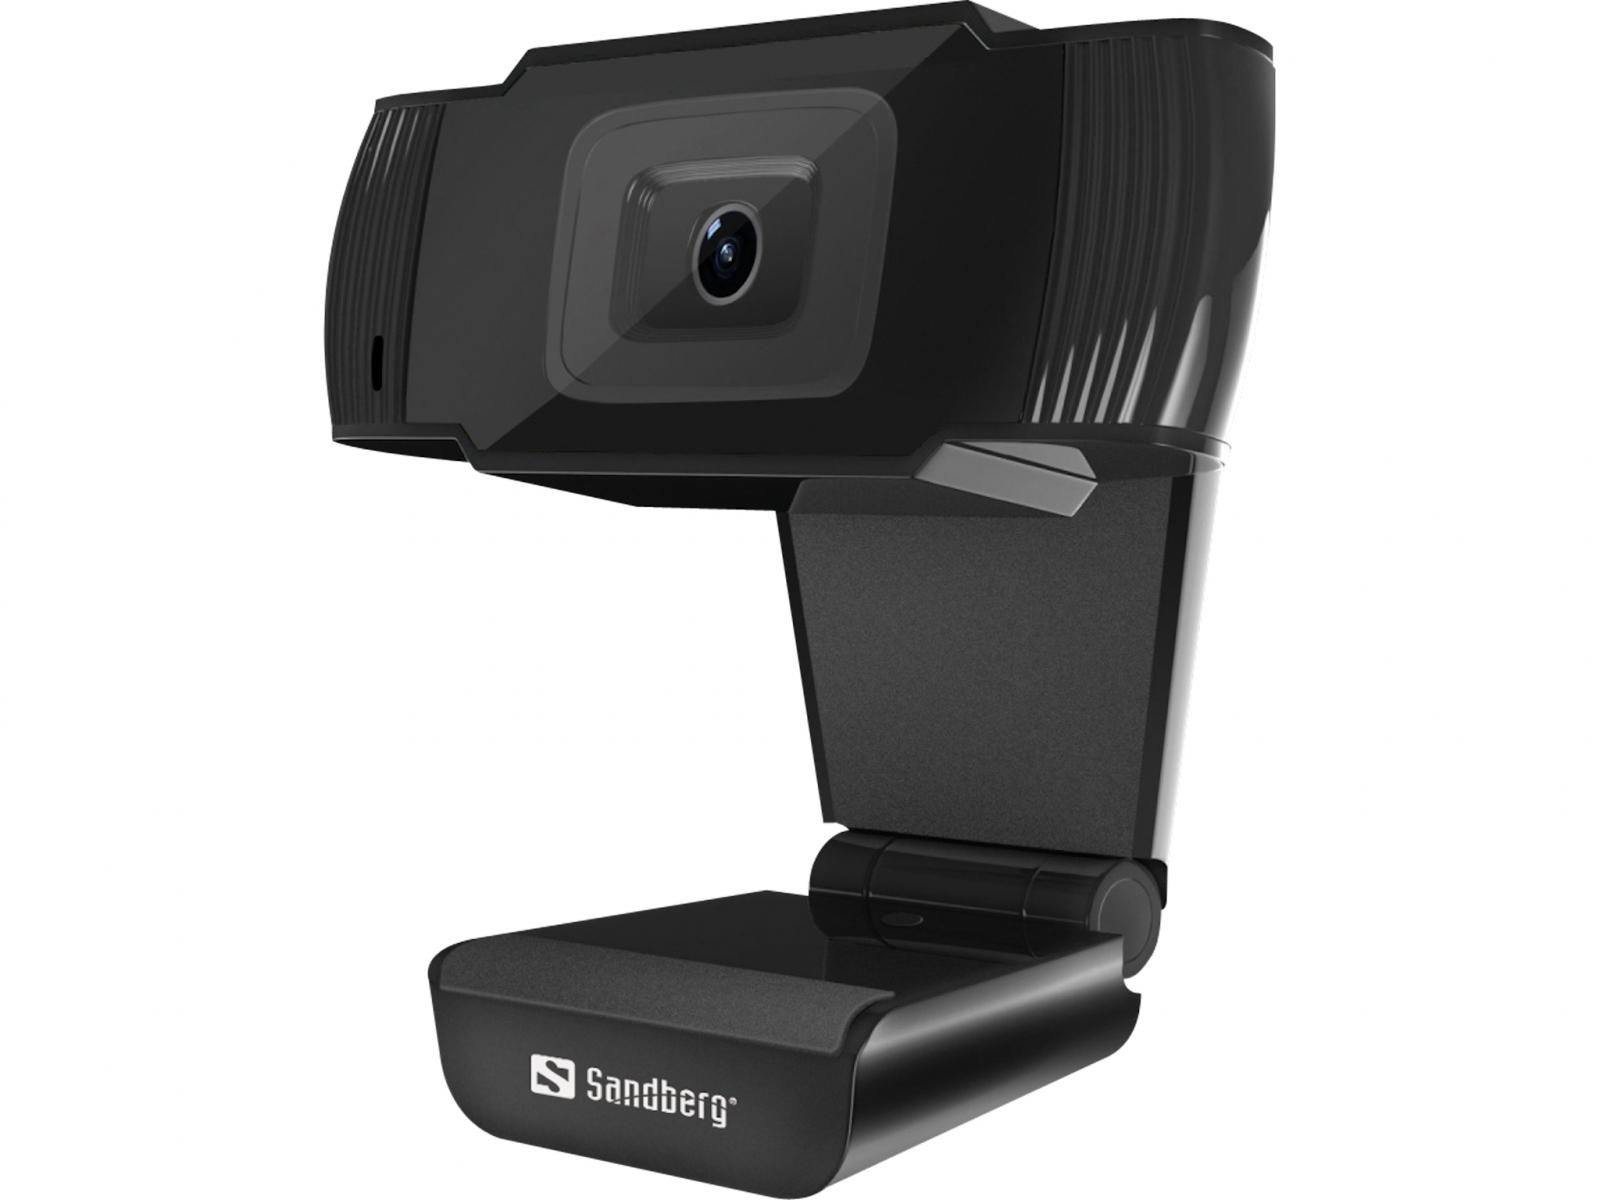 Camera web Sandberg Saver 480p, cu microfon